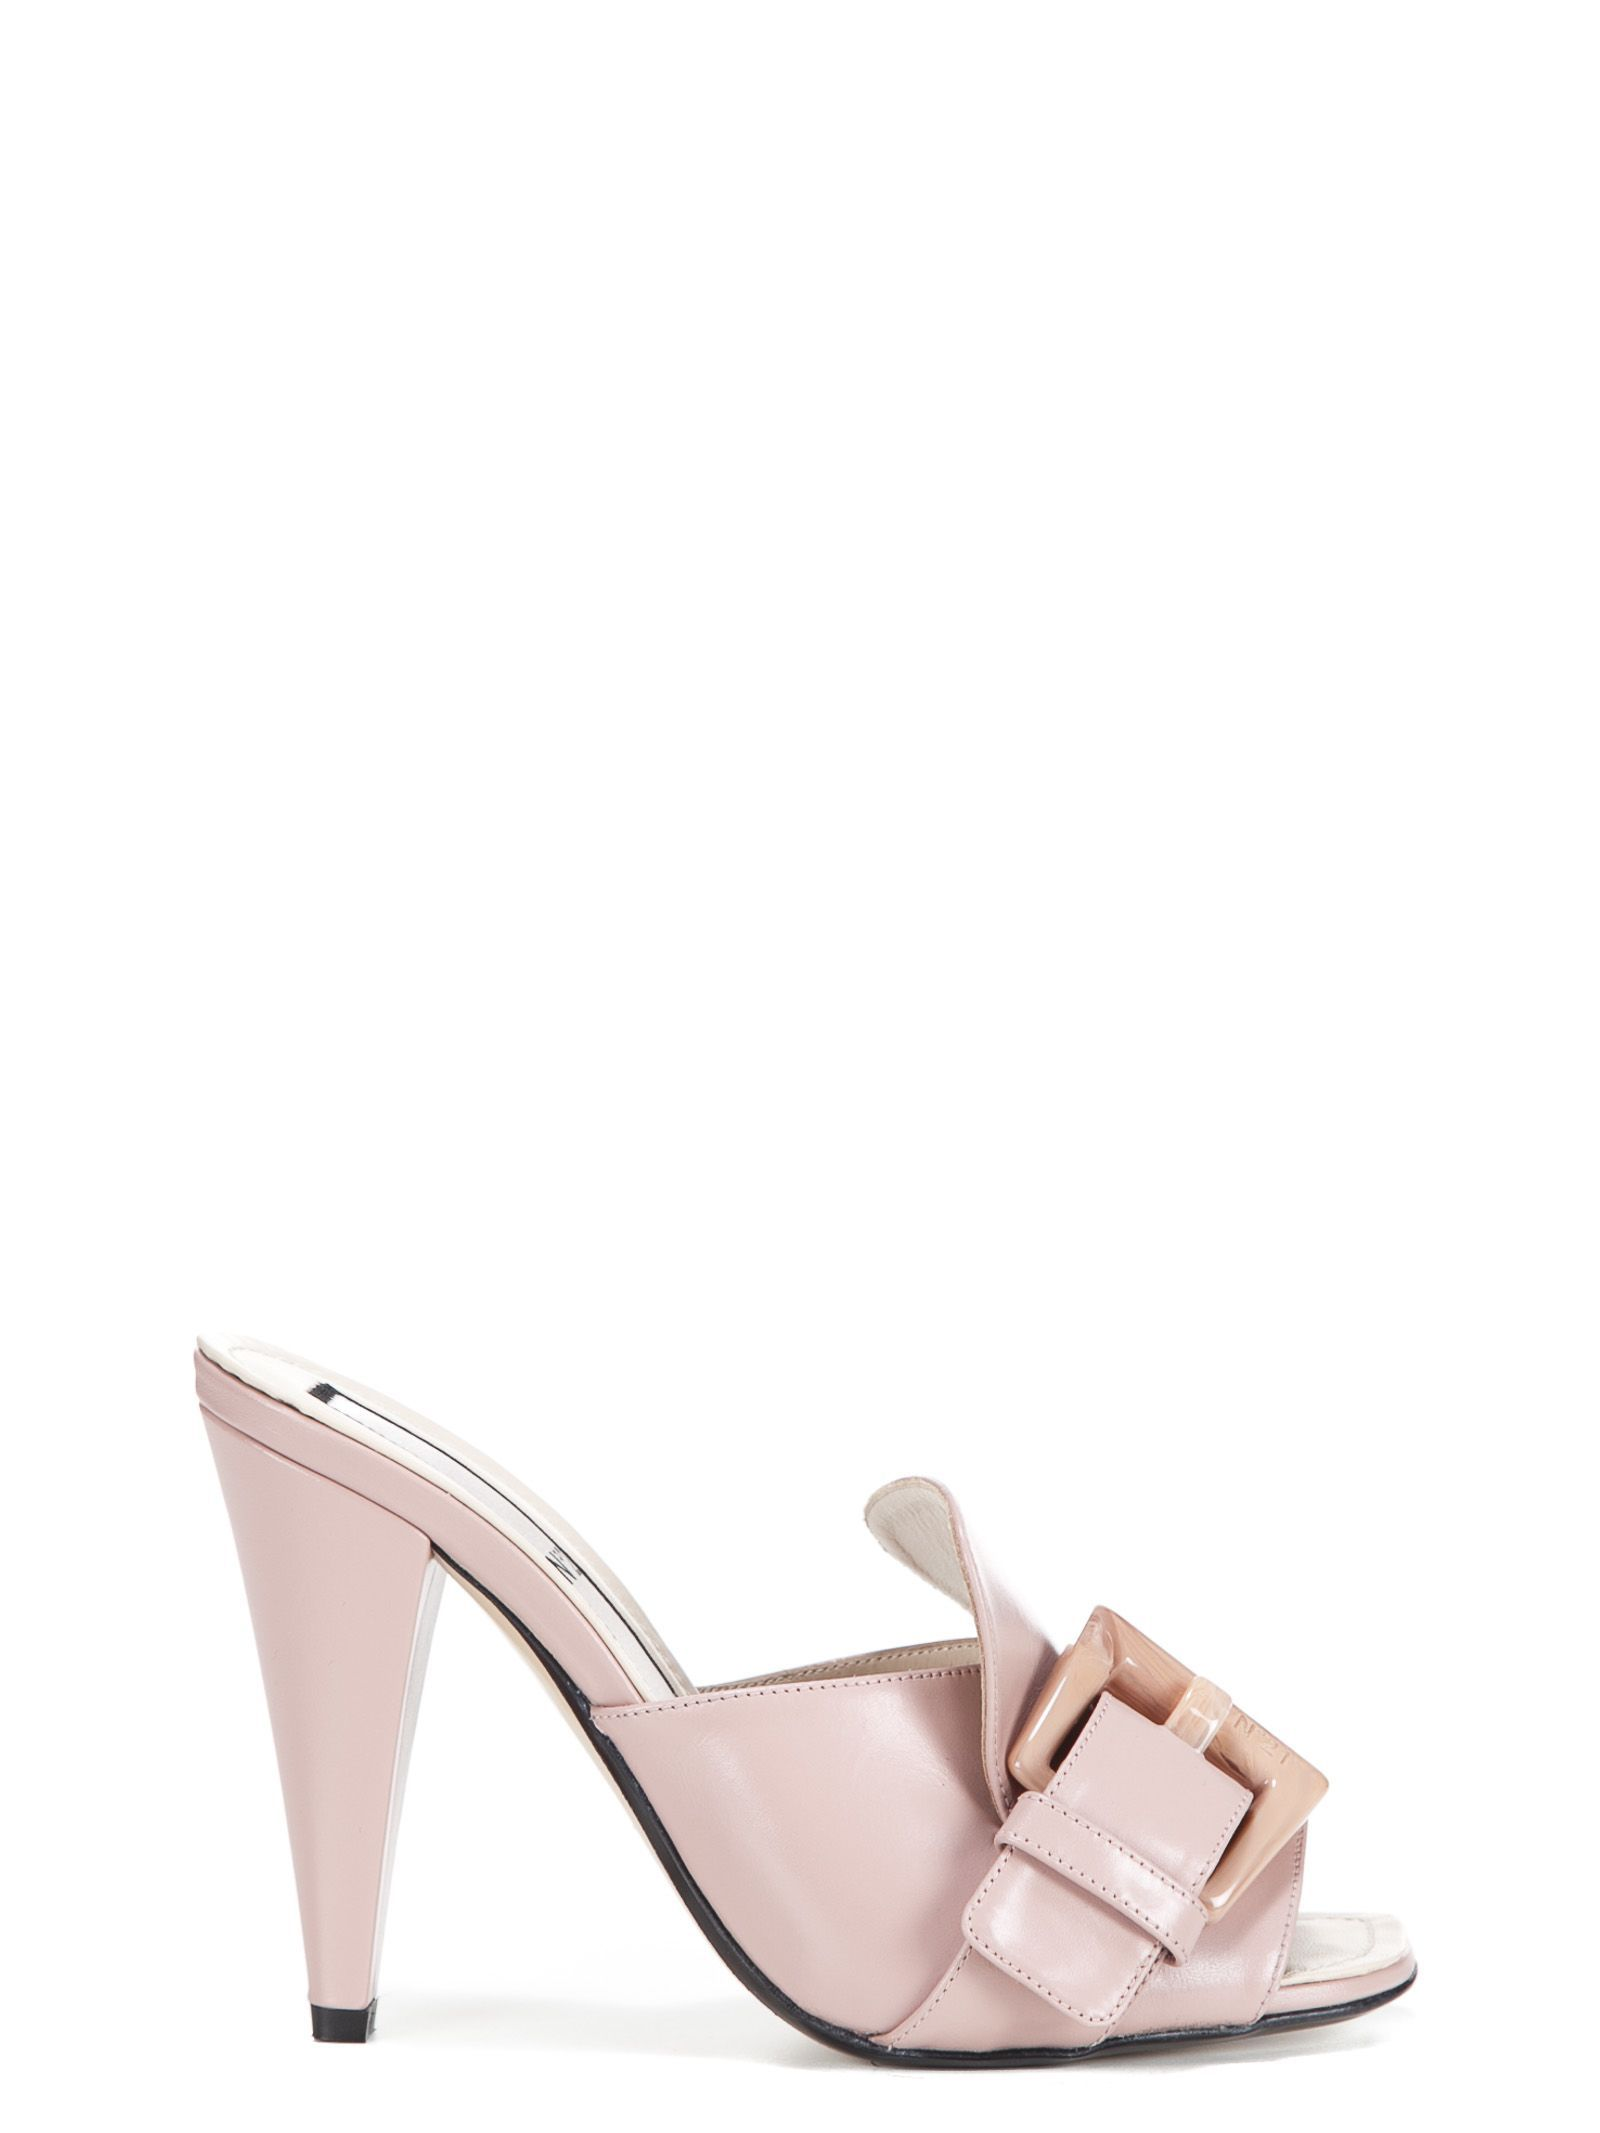 embellished multi-strap heeled sandals - Black N CwqEzZb